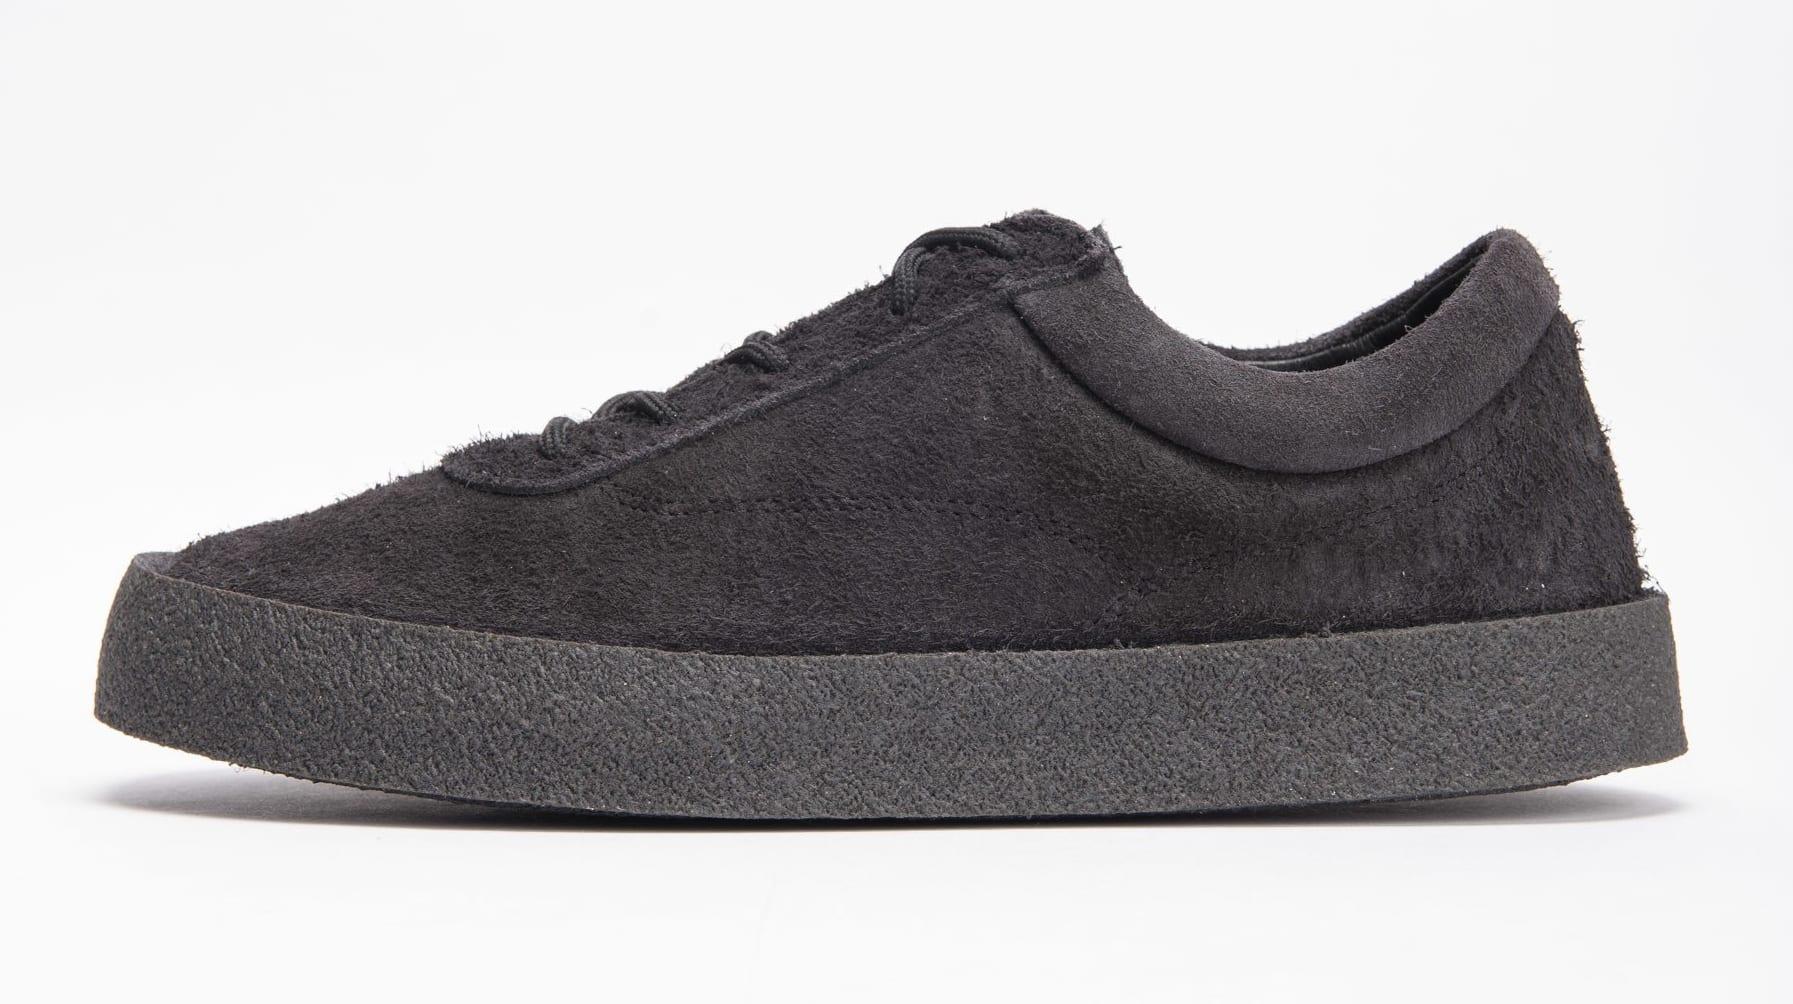 Season 6 Crepe Sneaker in Black Yeezy by Kanye West su1VvNCxeM